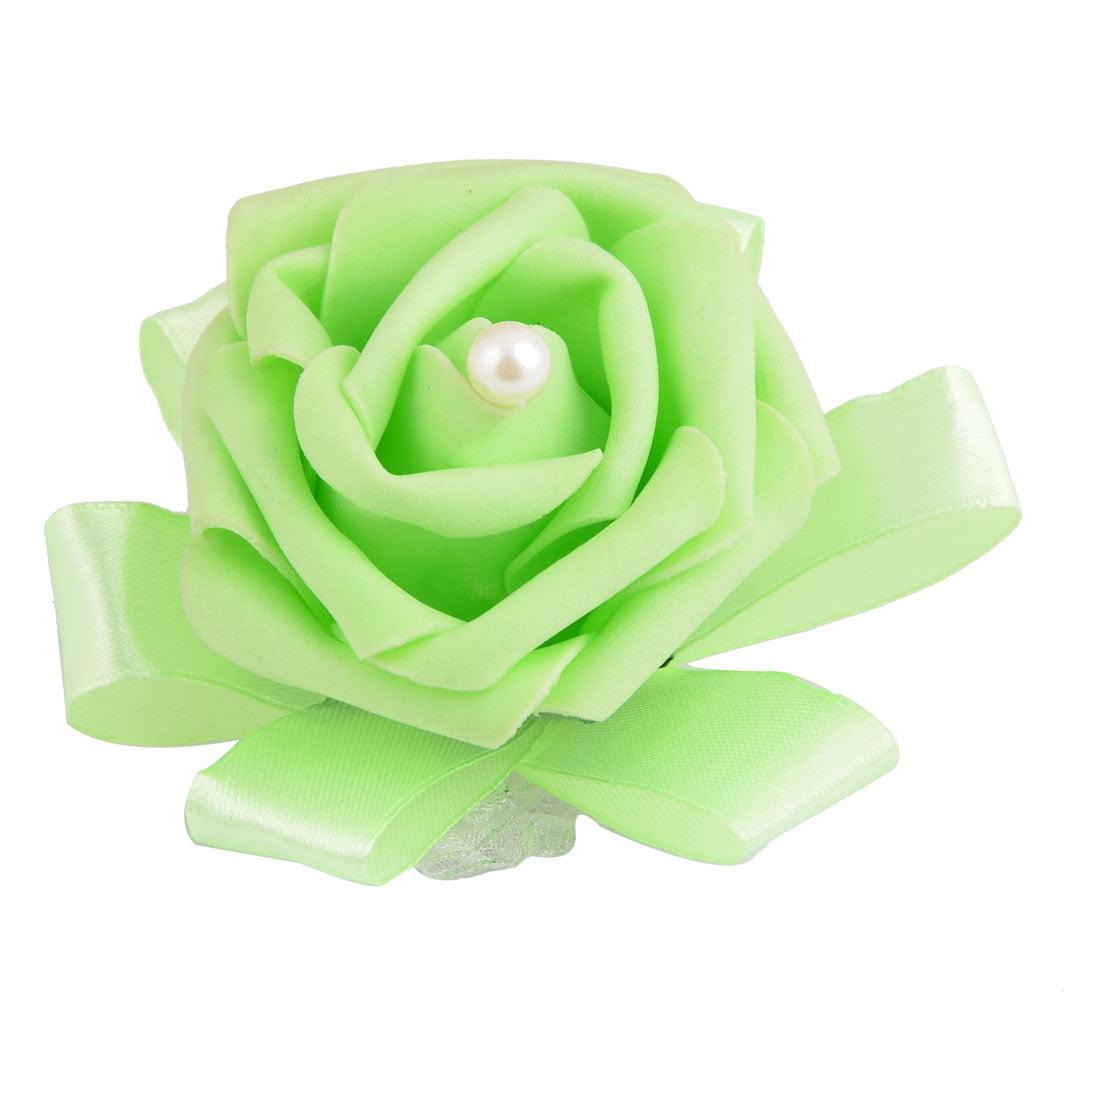 Unique Bargains Foam Rose Design Bridesmaid Hand Decorative Artificial Wrist Flower Light Green - image 3 of 3